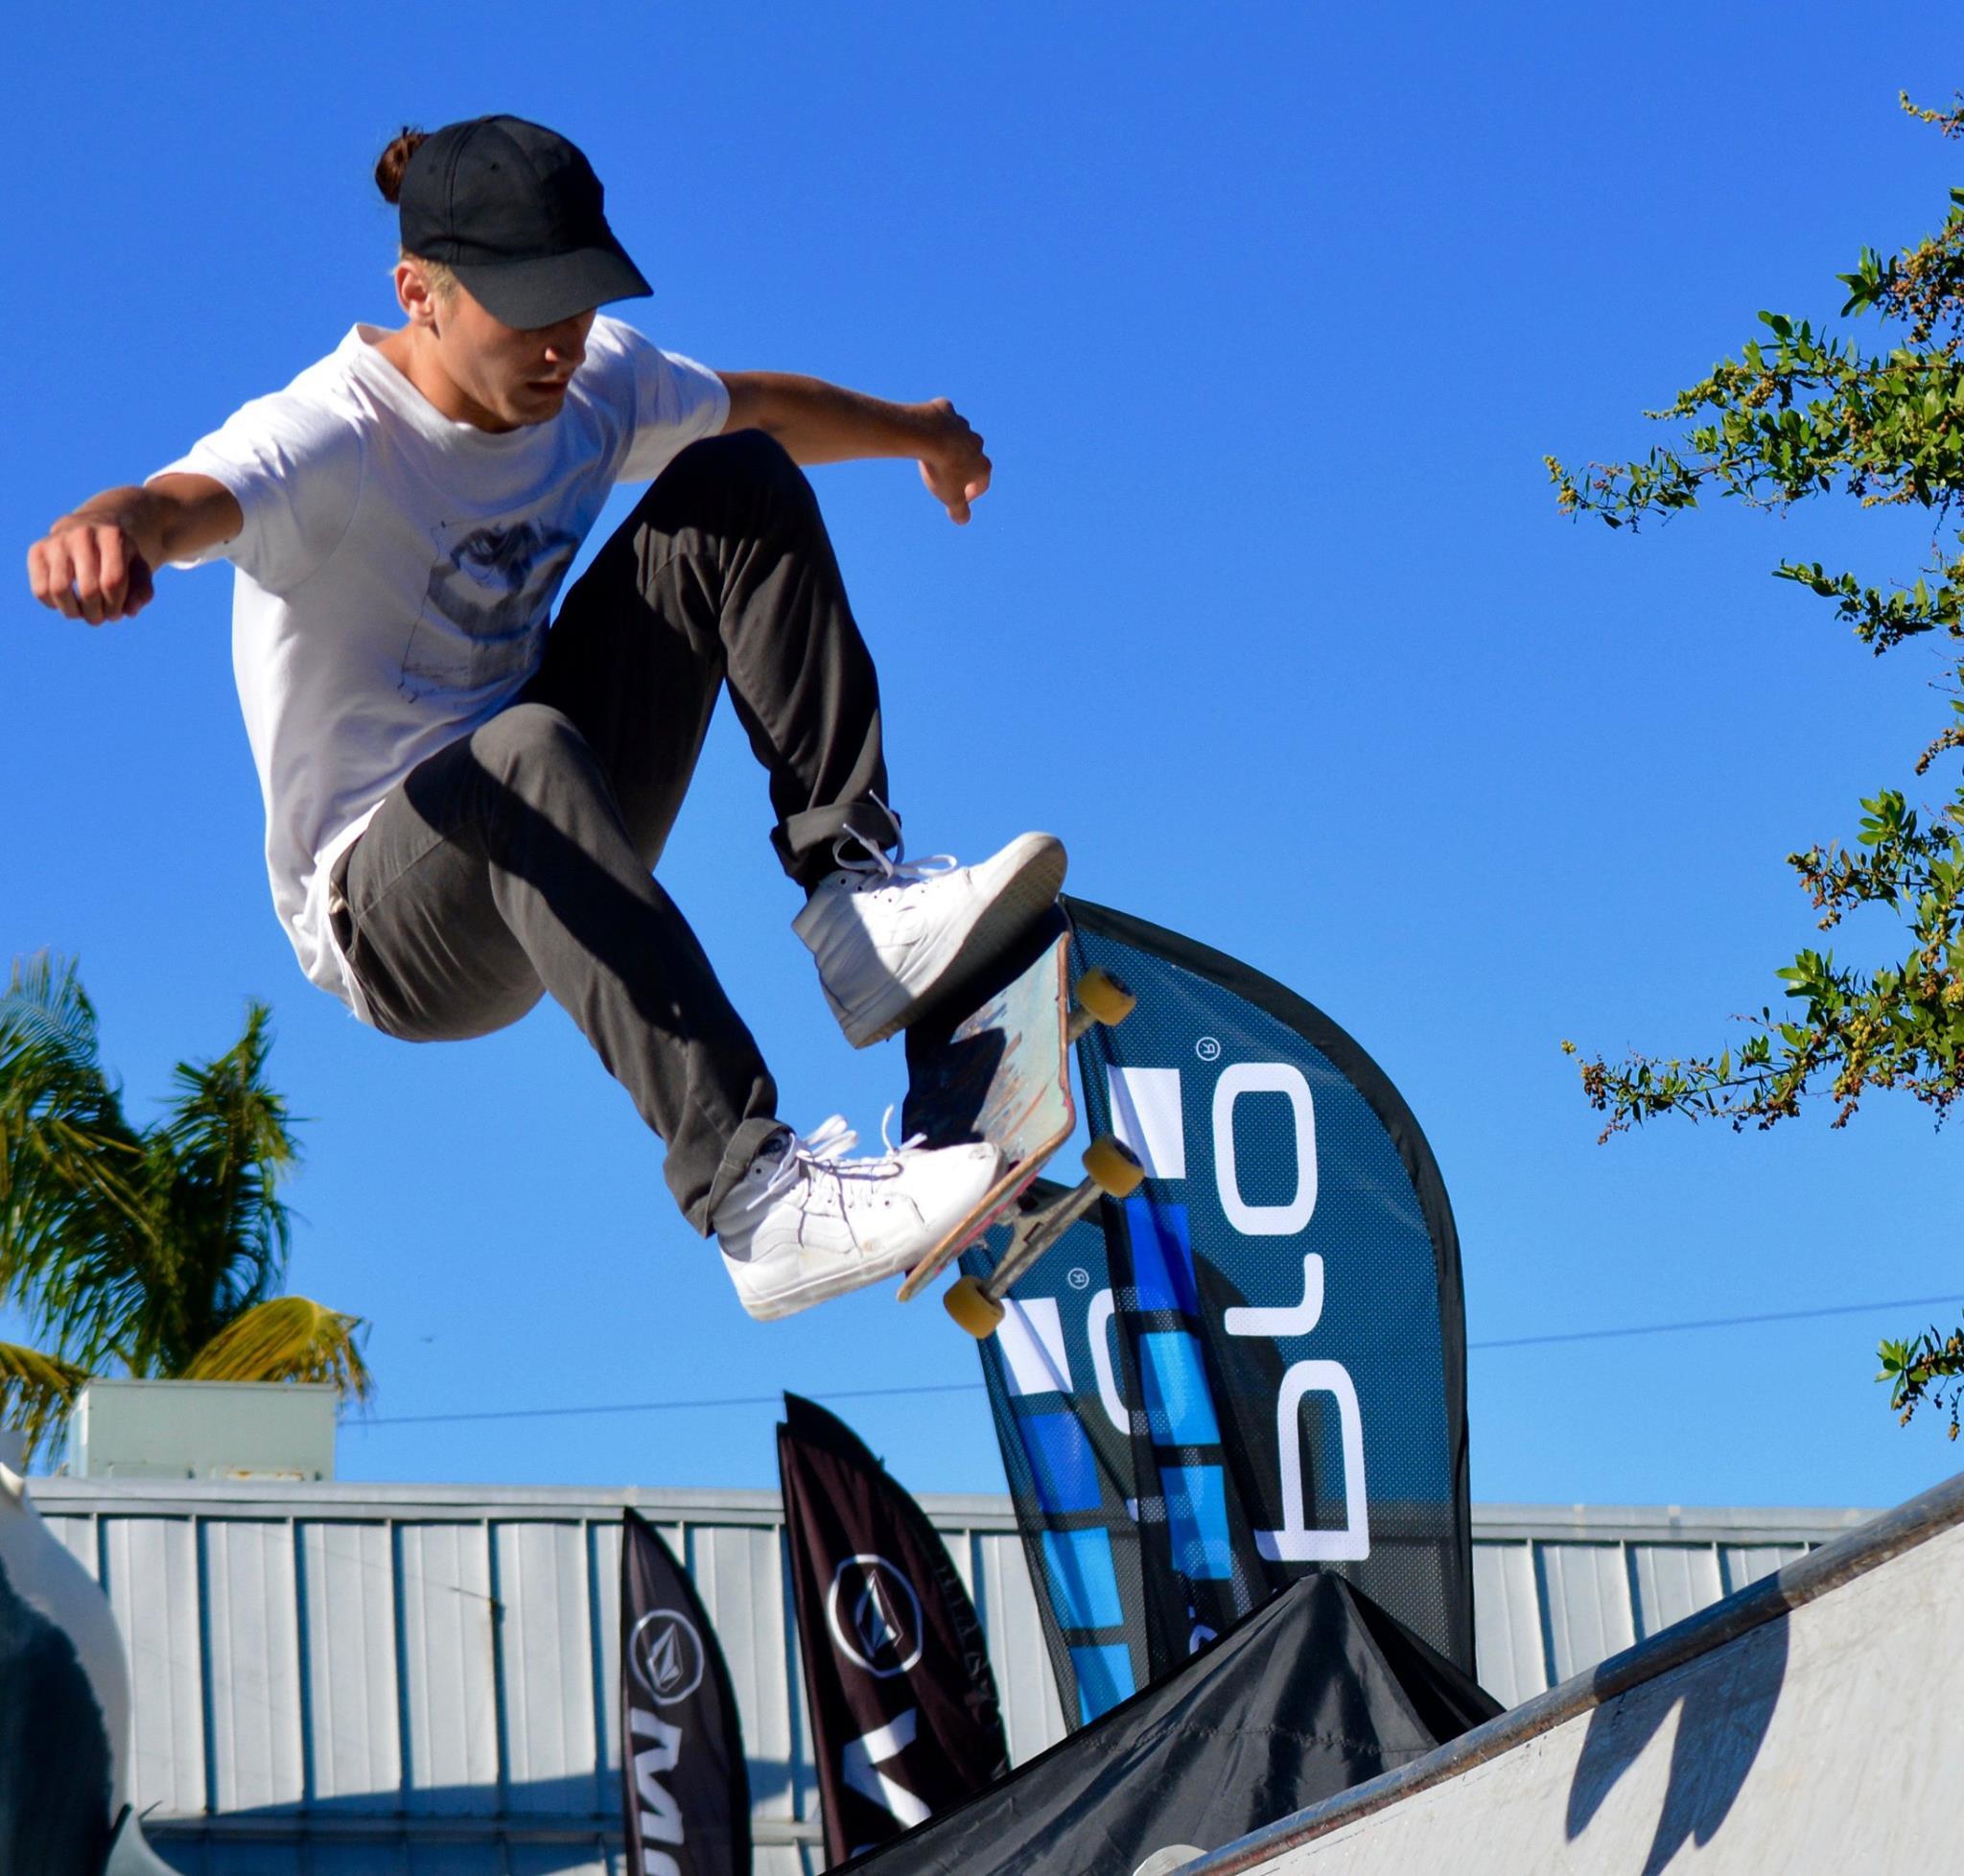 Dude getting air on his skateboard